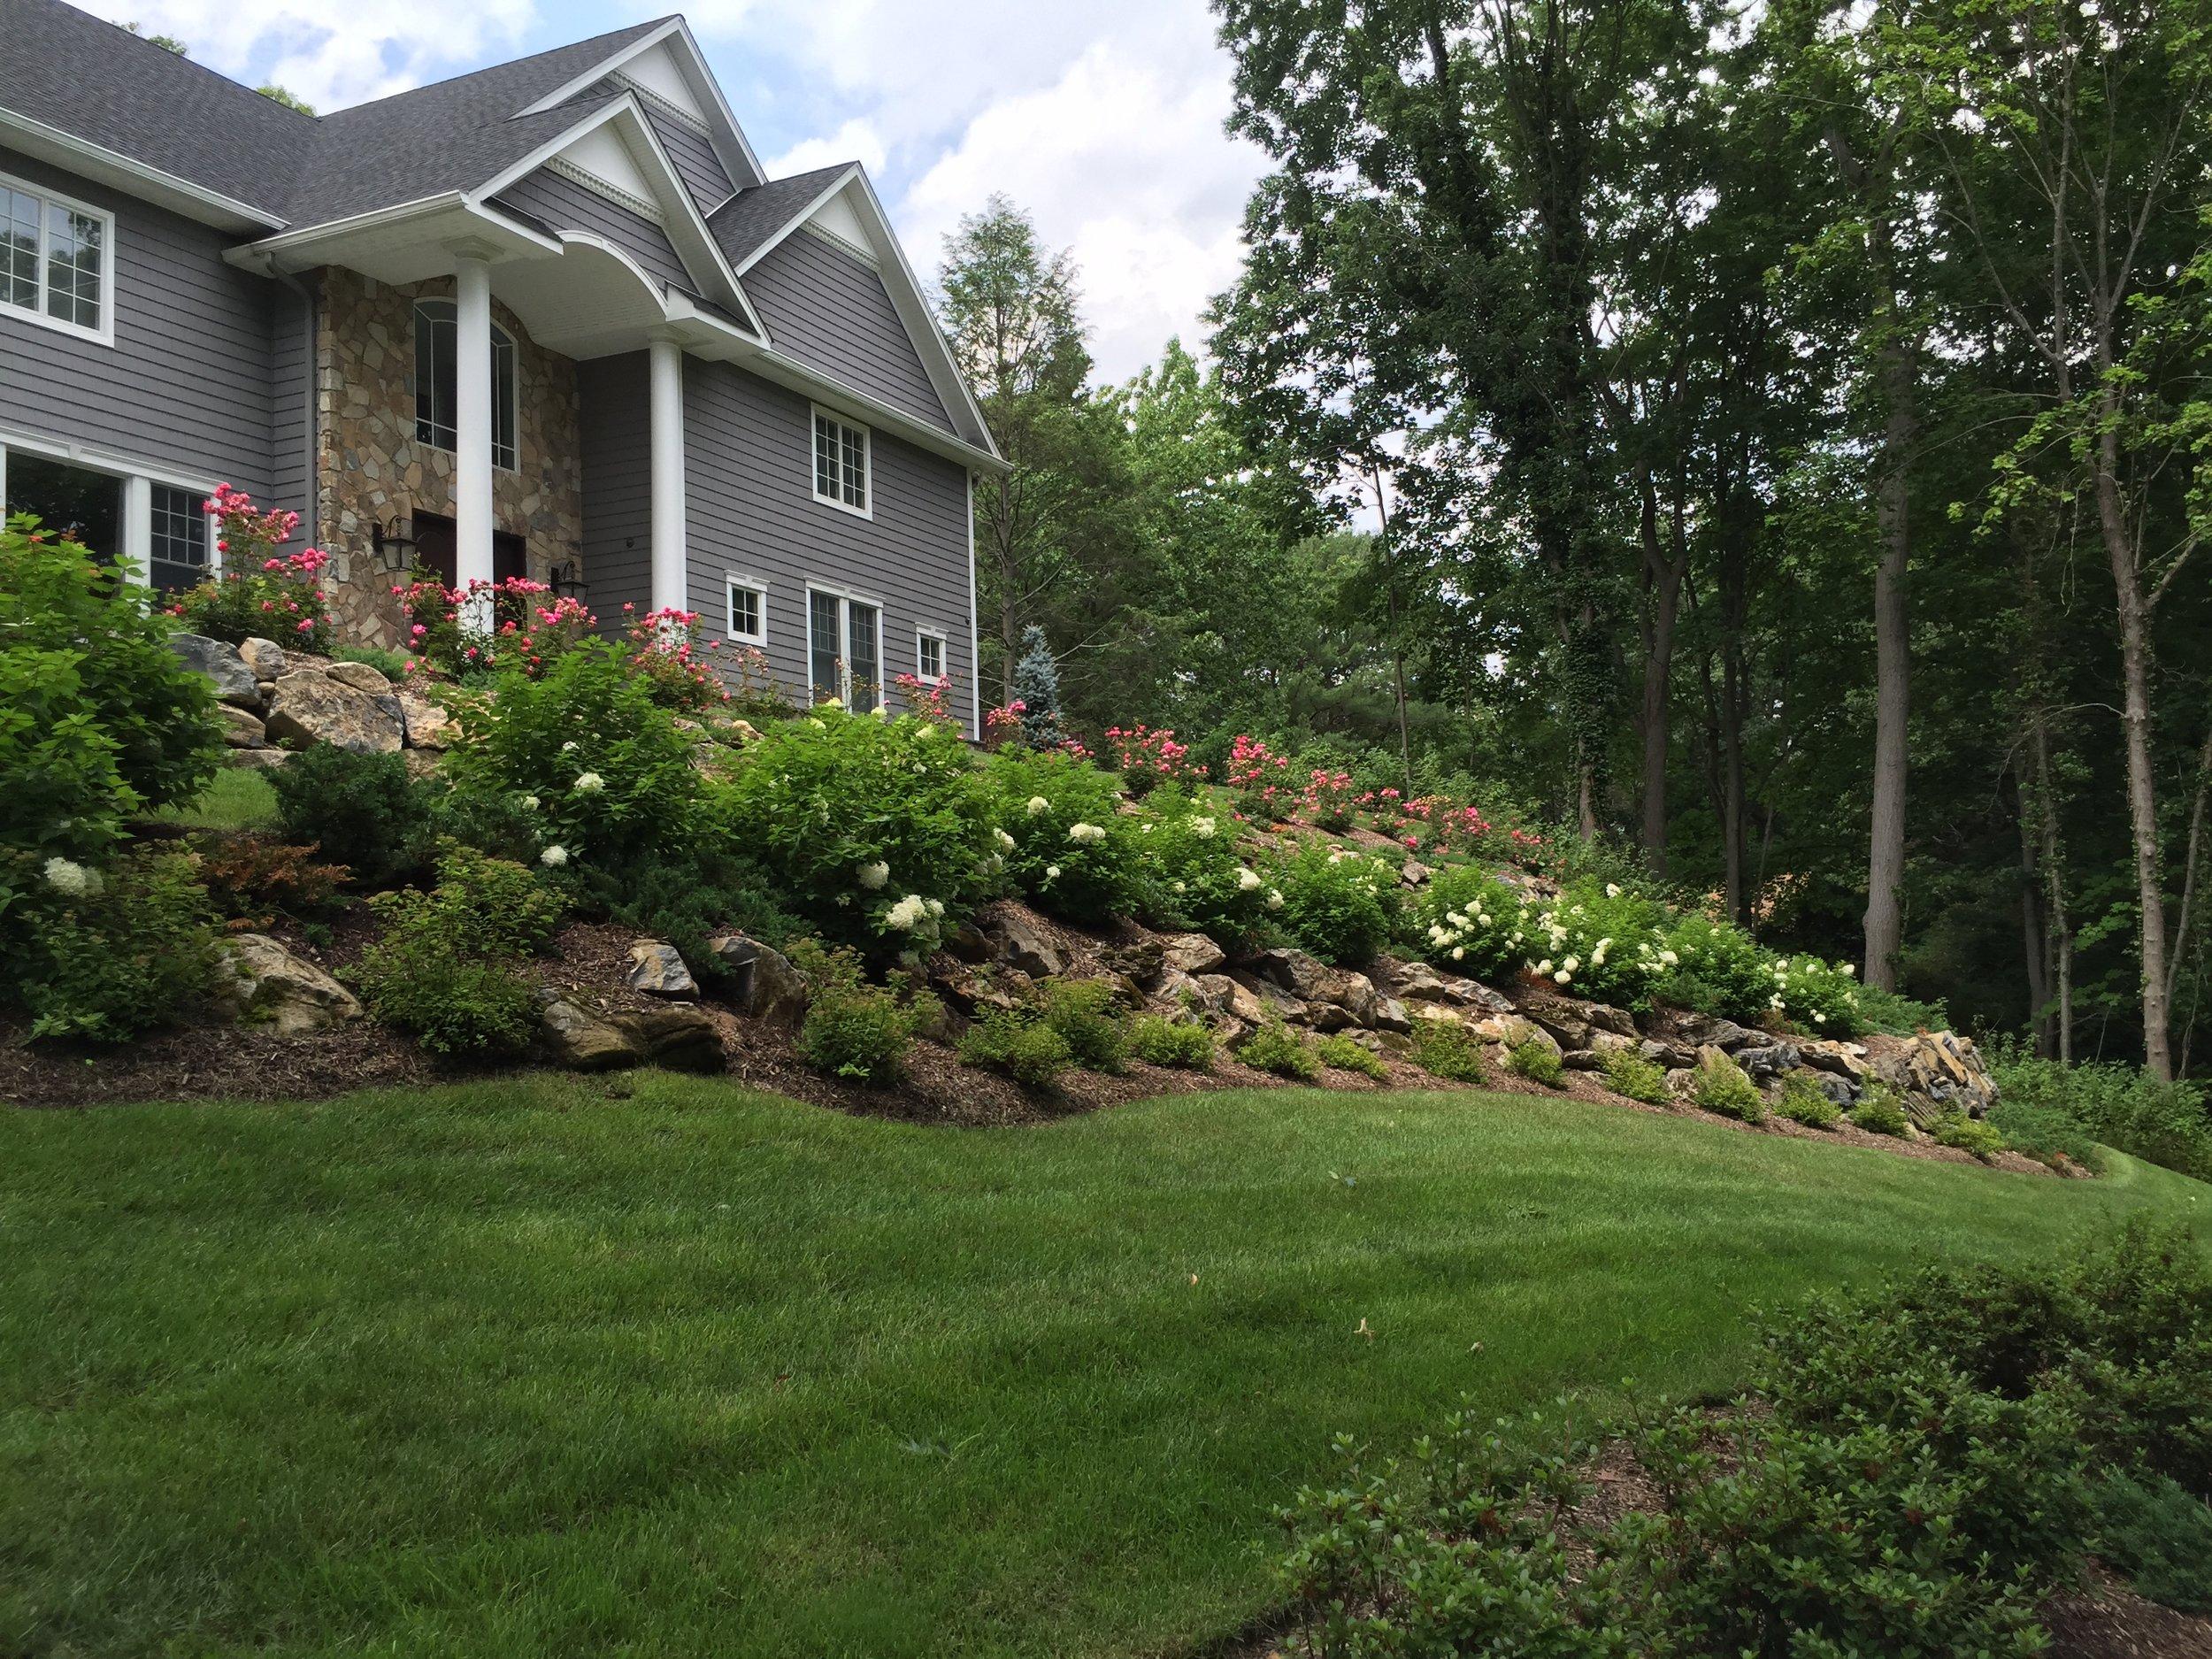 Top landscape shrub design company in Long Island, NY